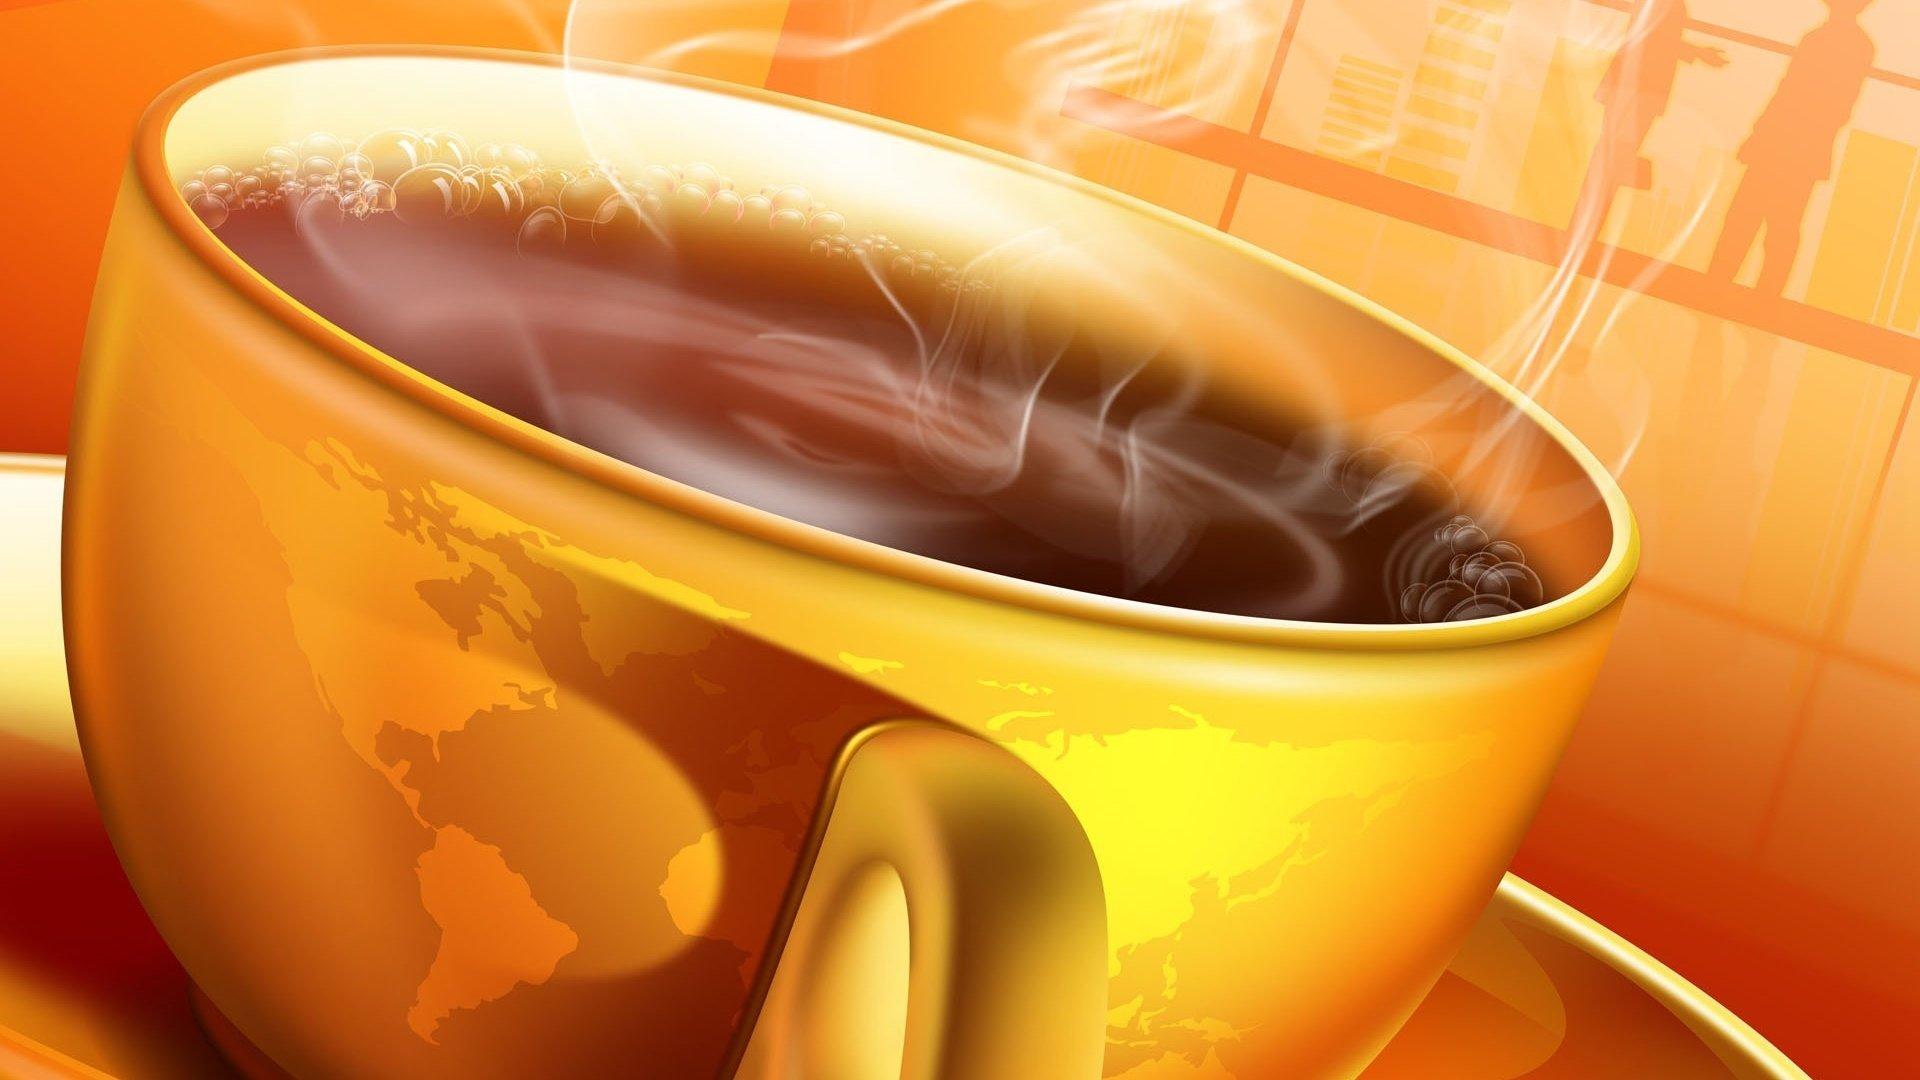 чашечка кофе с утра на телефон